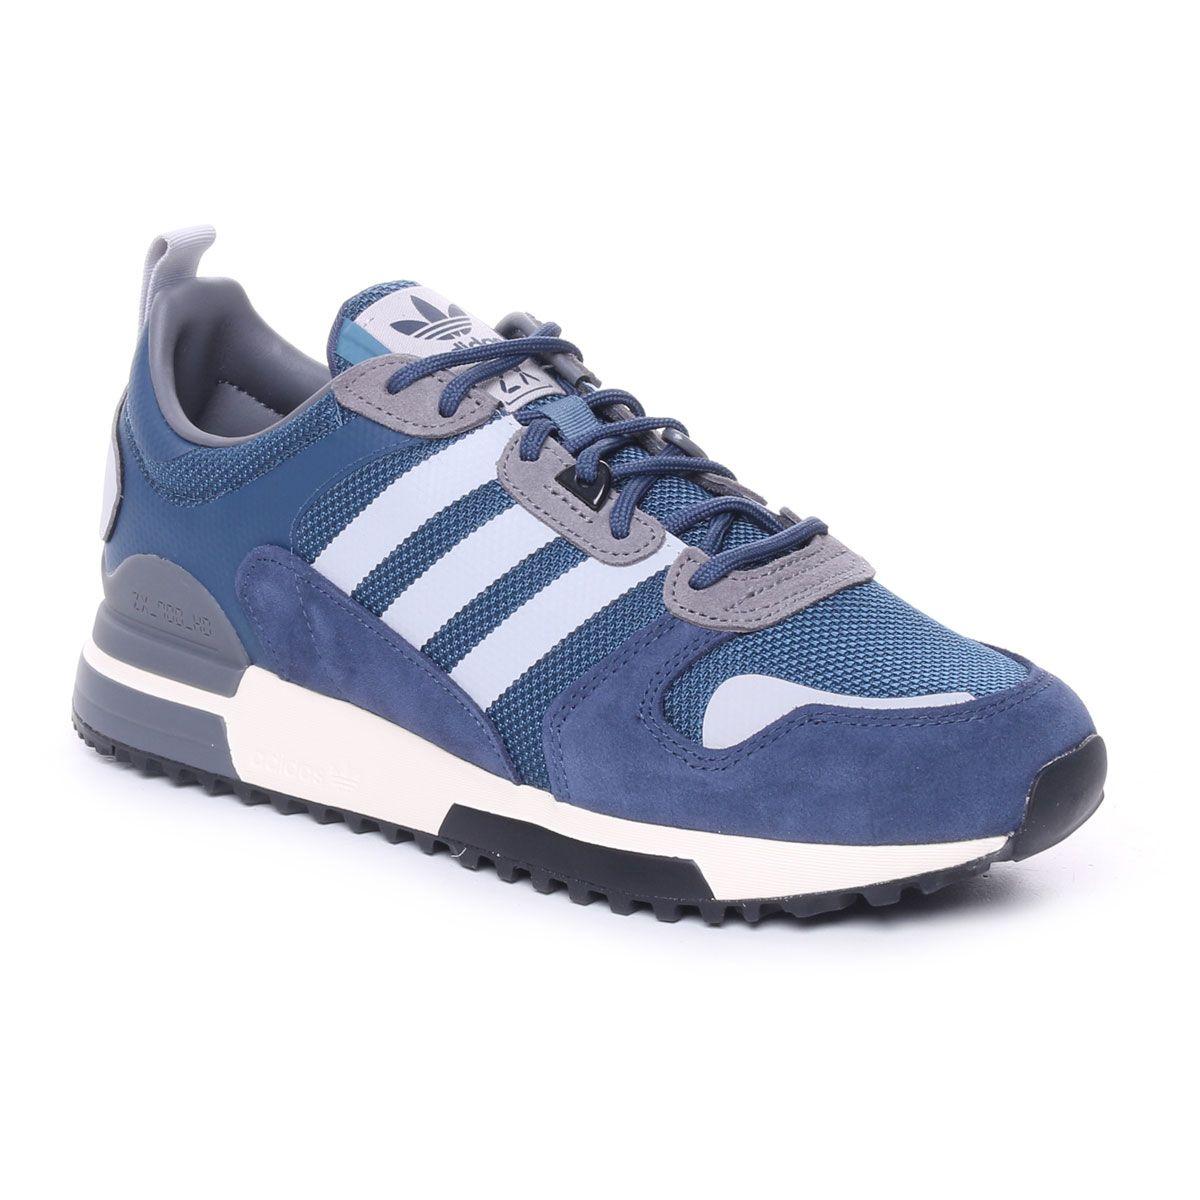 adidas Zx 700 Hd Uomo Blu Grigio